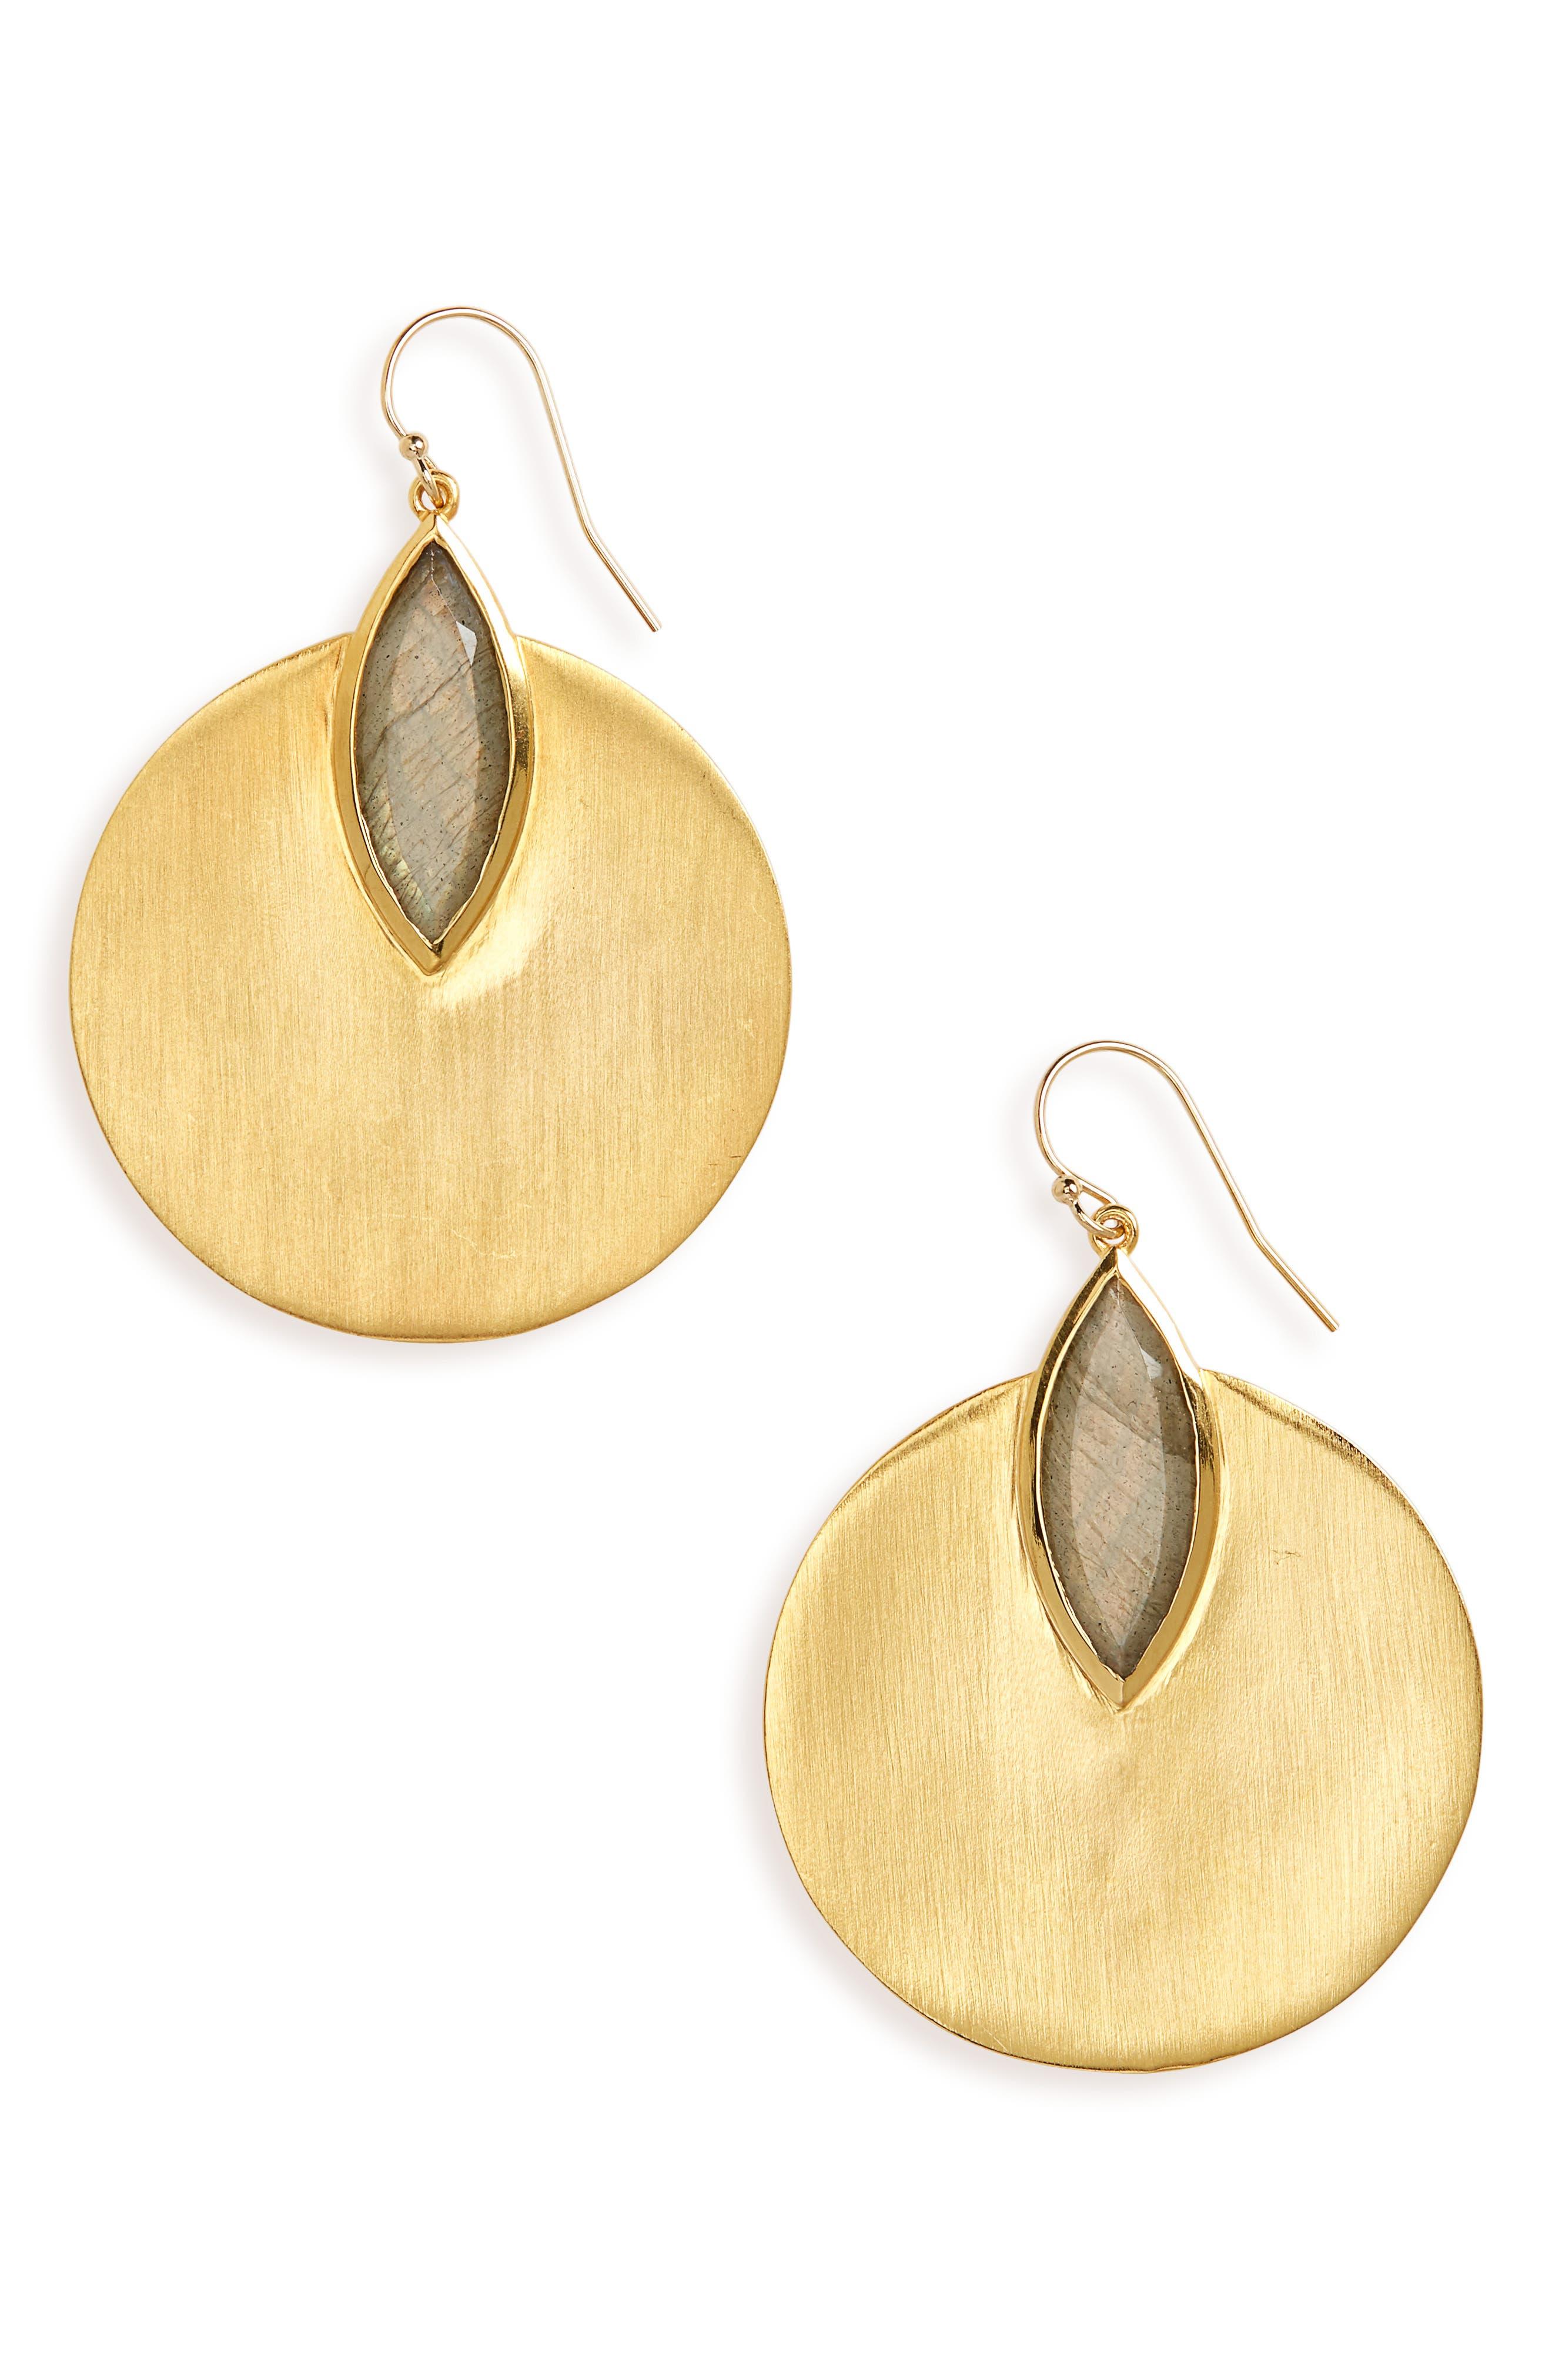 Lotus Disc Earrings,                             Main thumbnail 1, color,                             Labradorite/ Gold